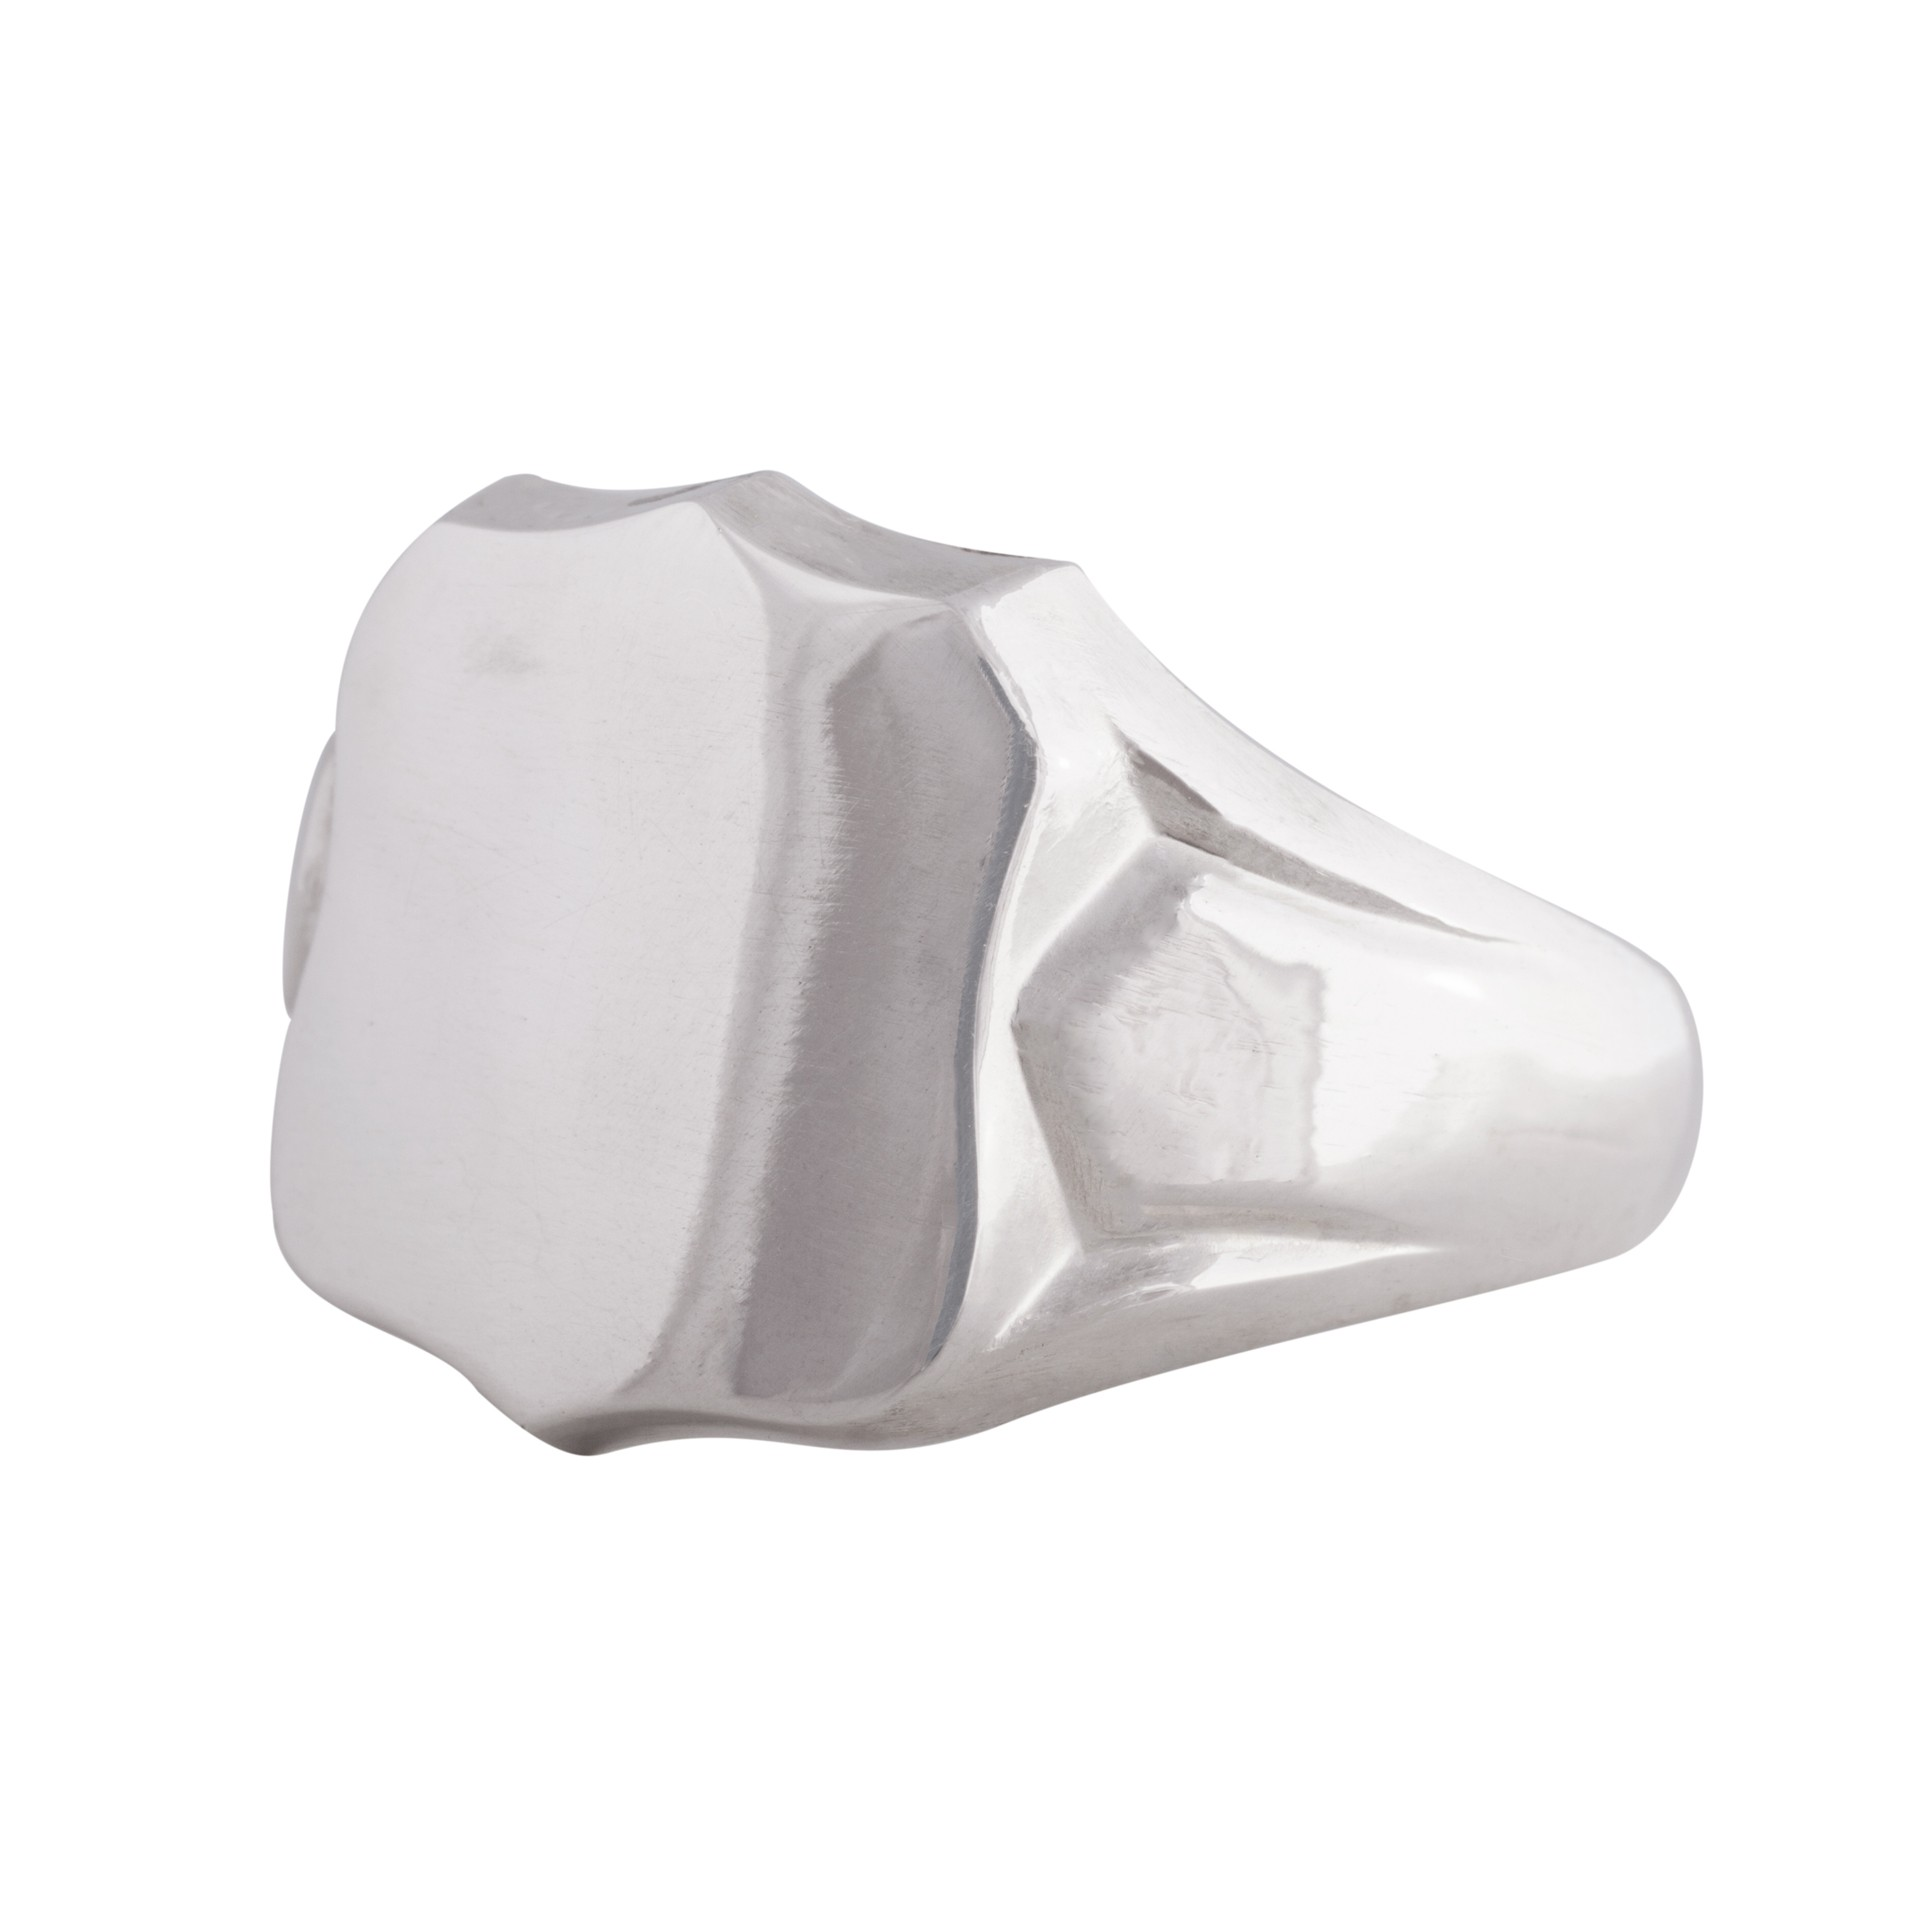 Shield silver signet ring